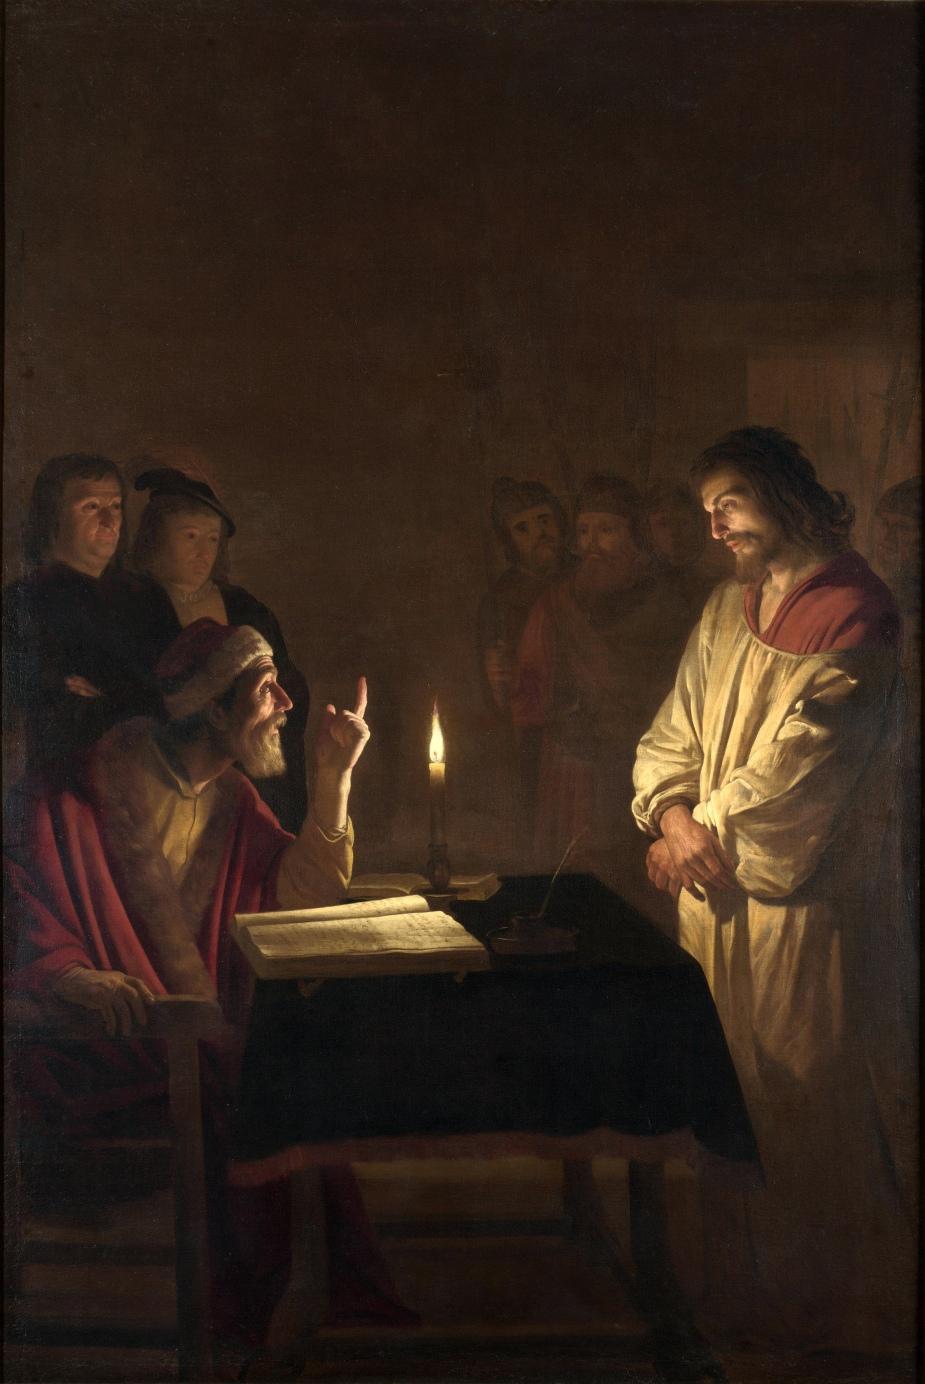 Gerard_van_Honthorst_-_Christ_before_the_High_Priest